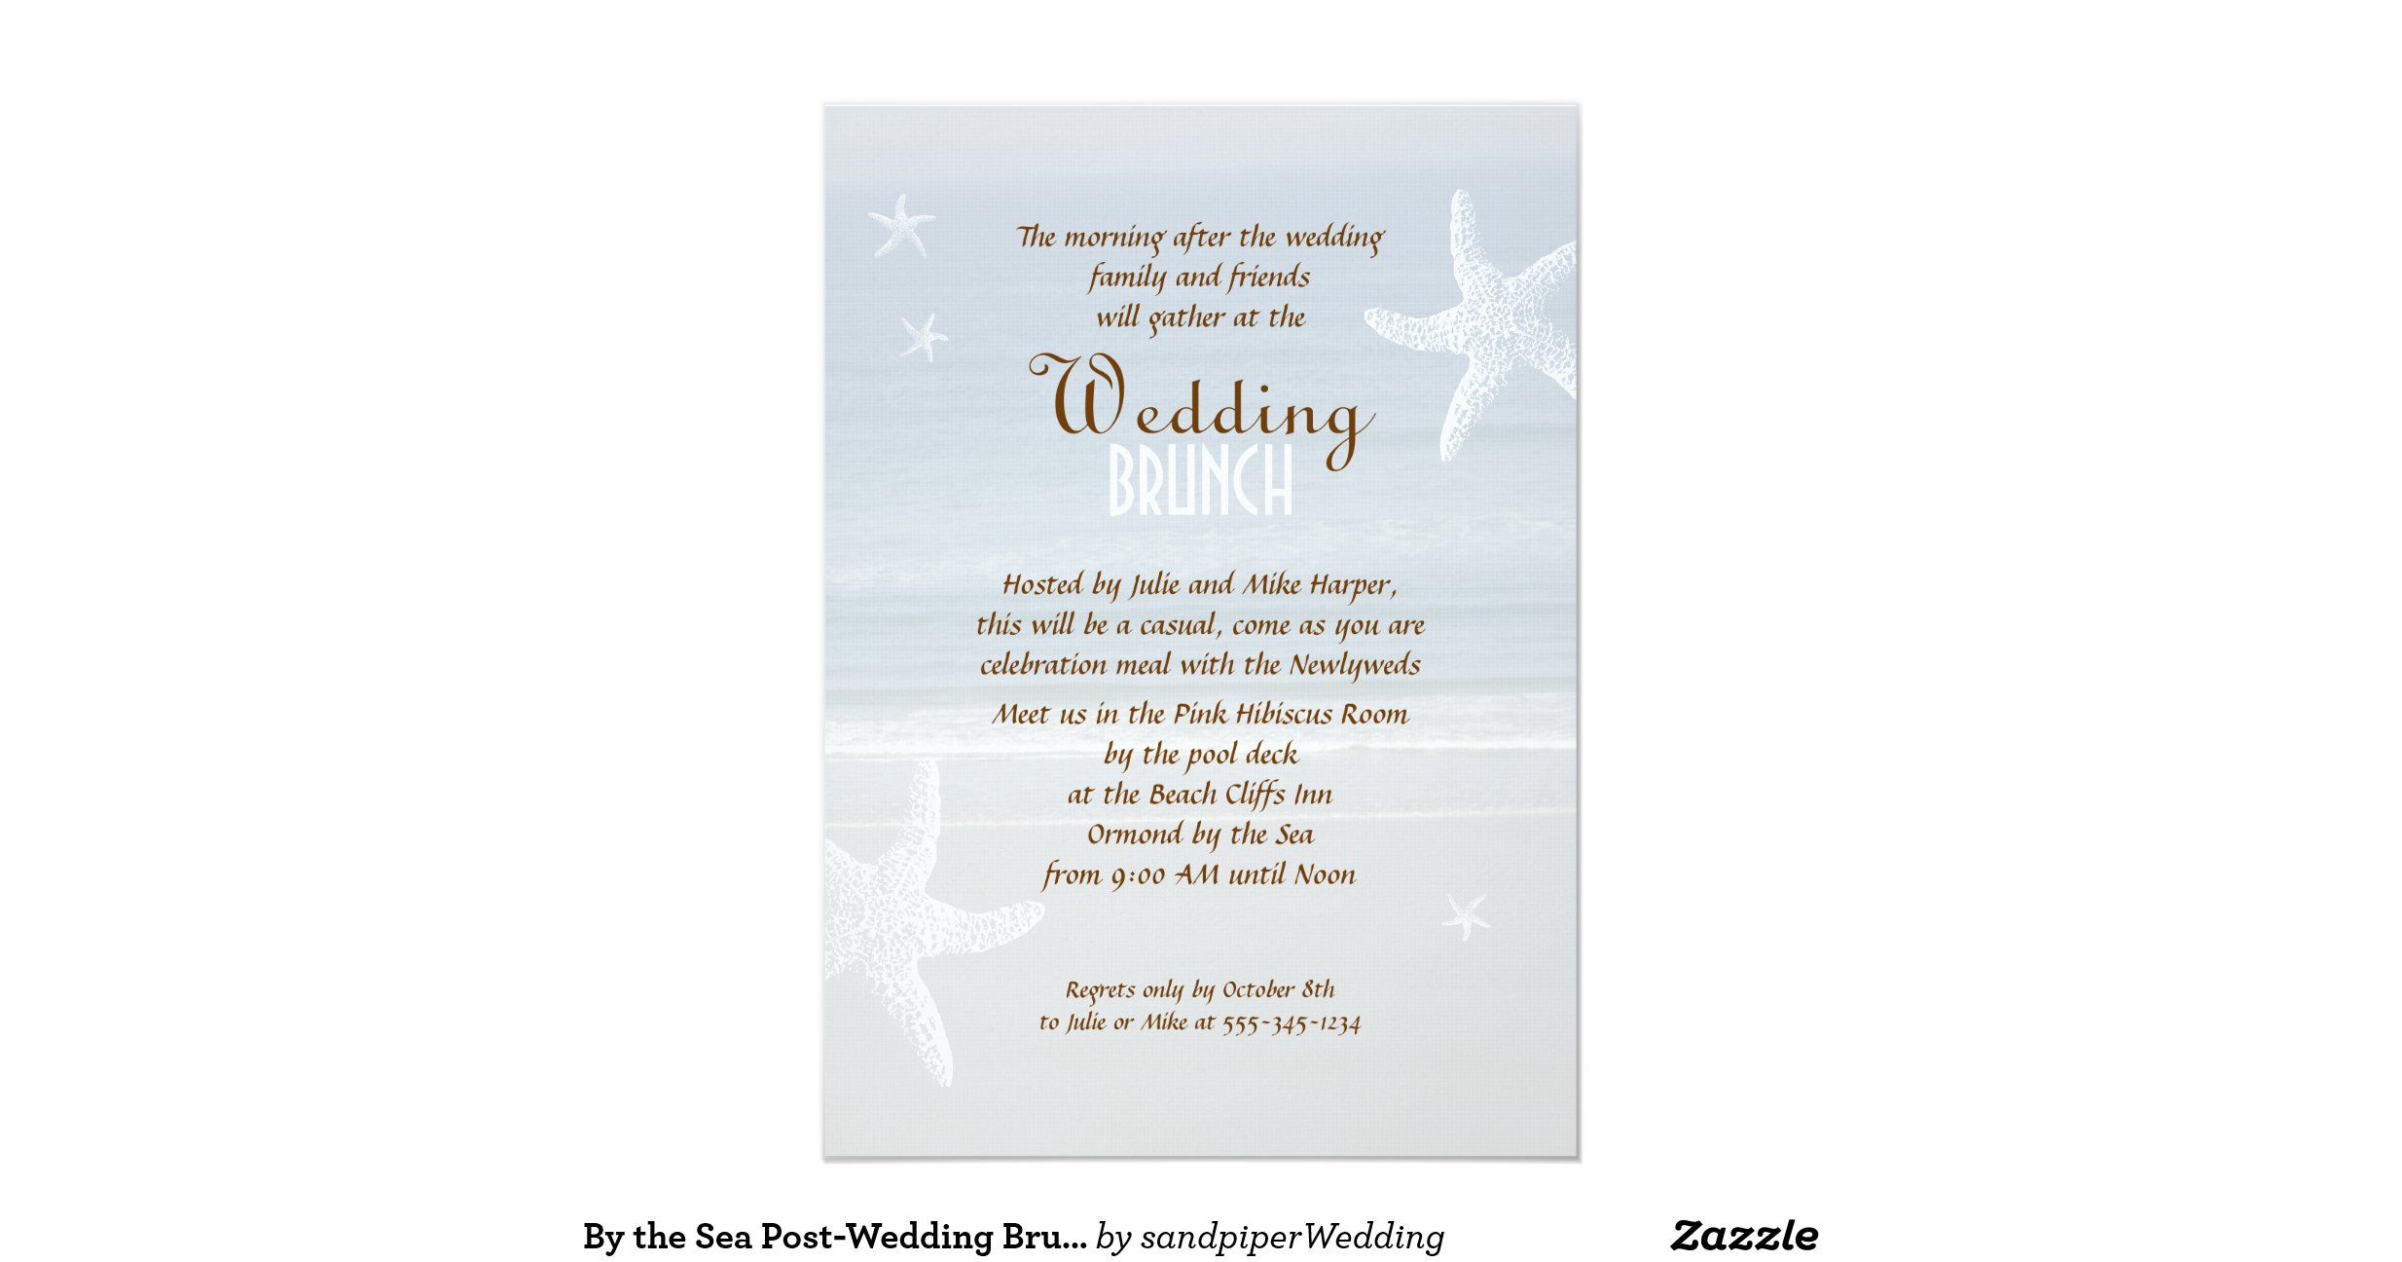 Post Wedding Brunch Invitation Wording: By_the_sea_post_wedding_brunch_invitation